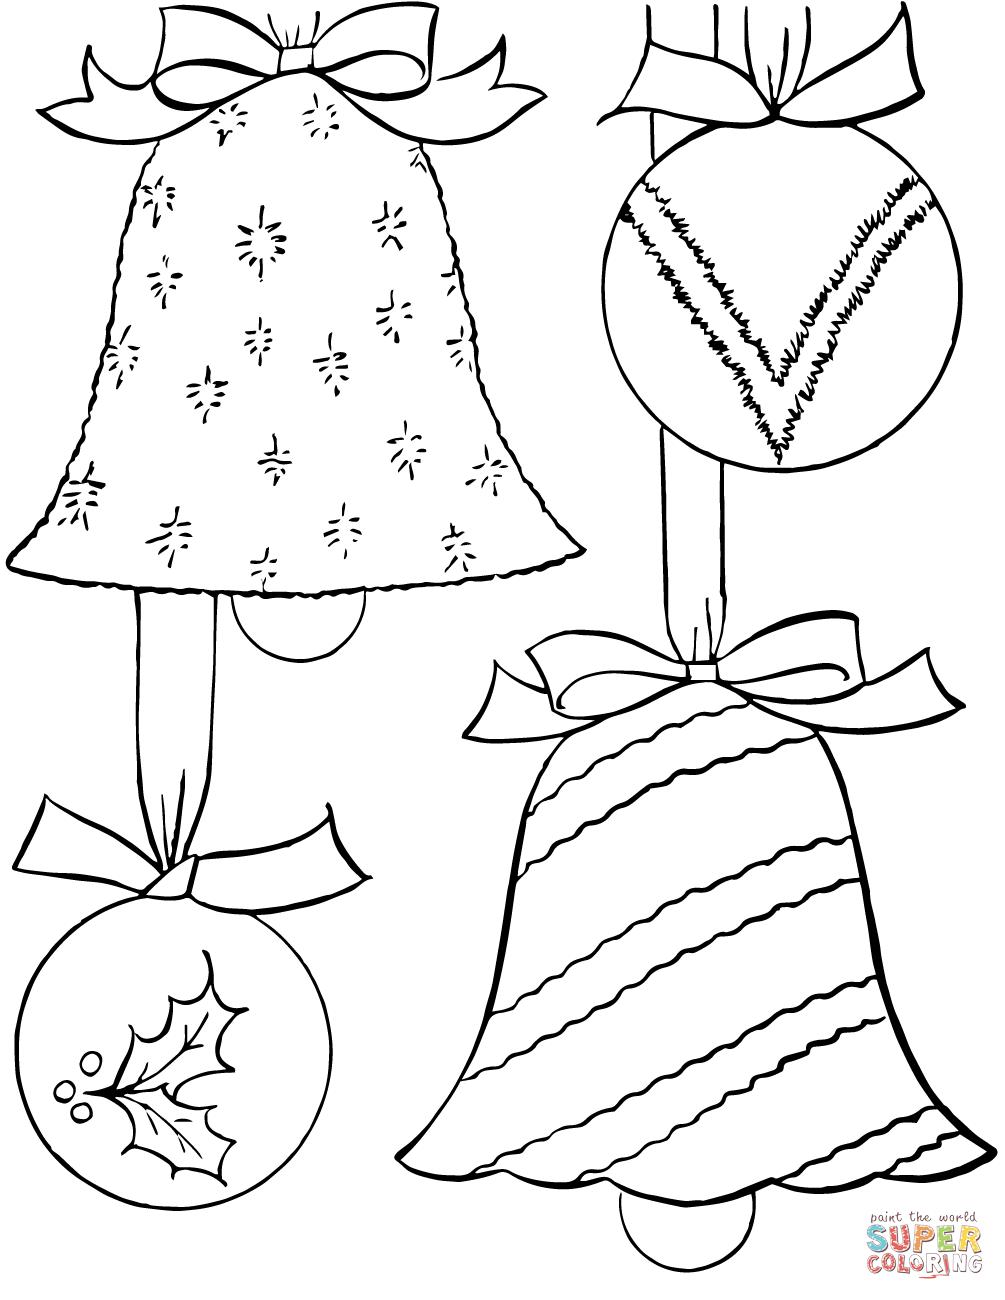 Christmas Ornament Coloringge Sheets Printable Fantasticges